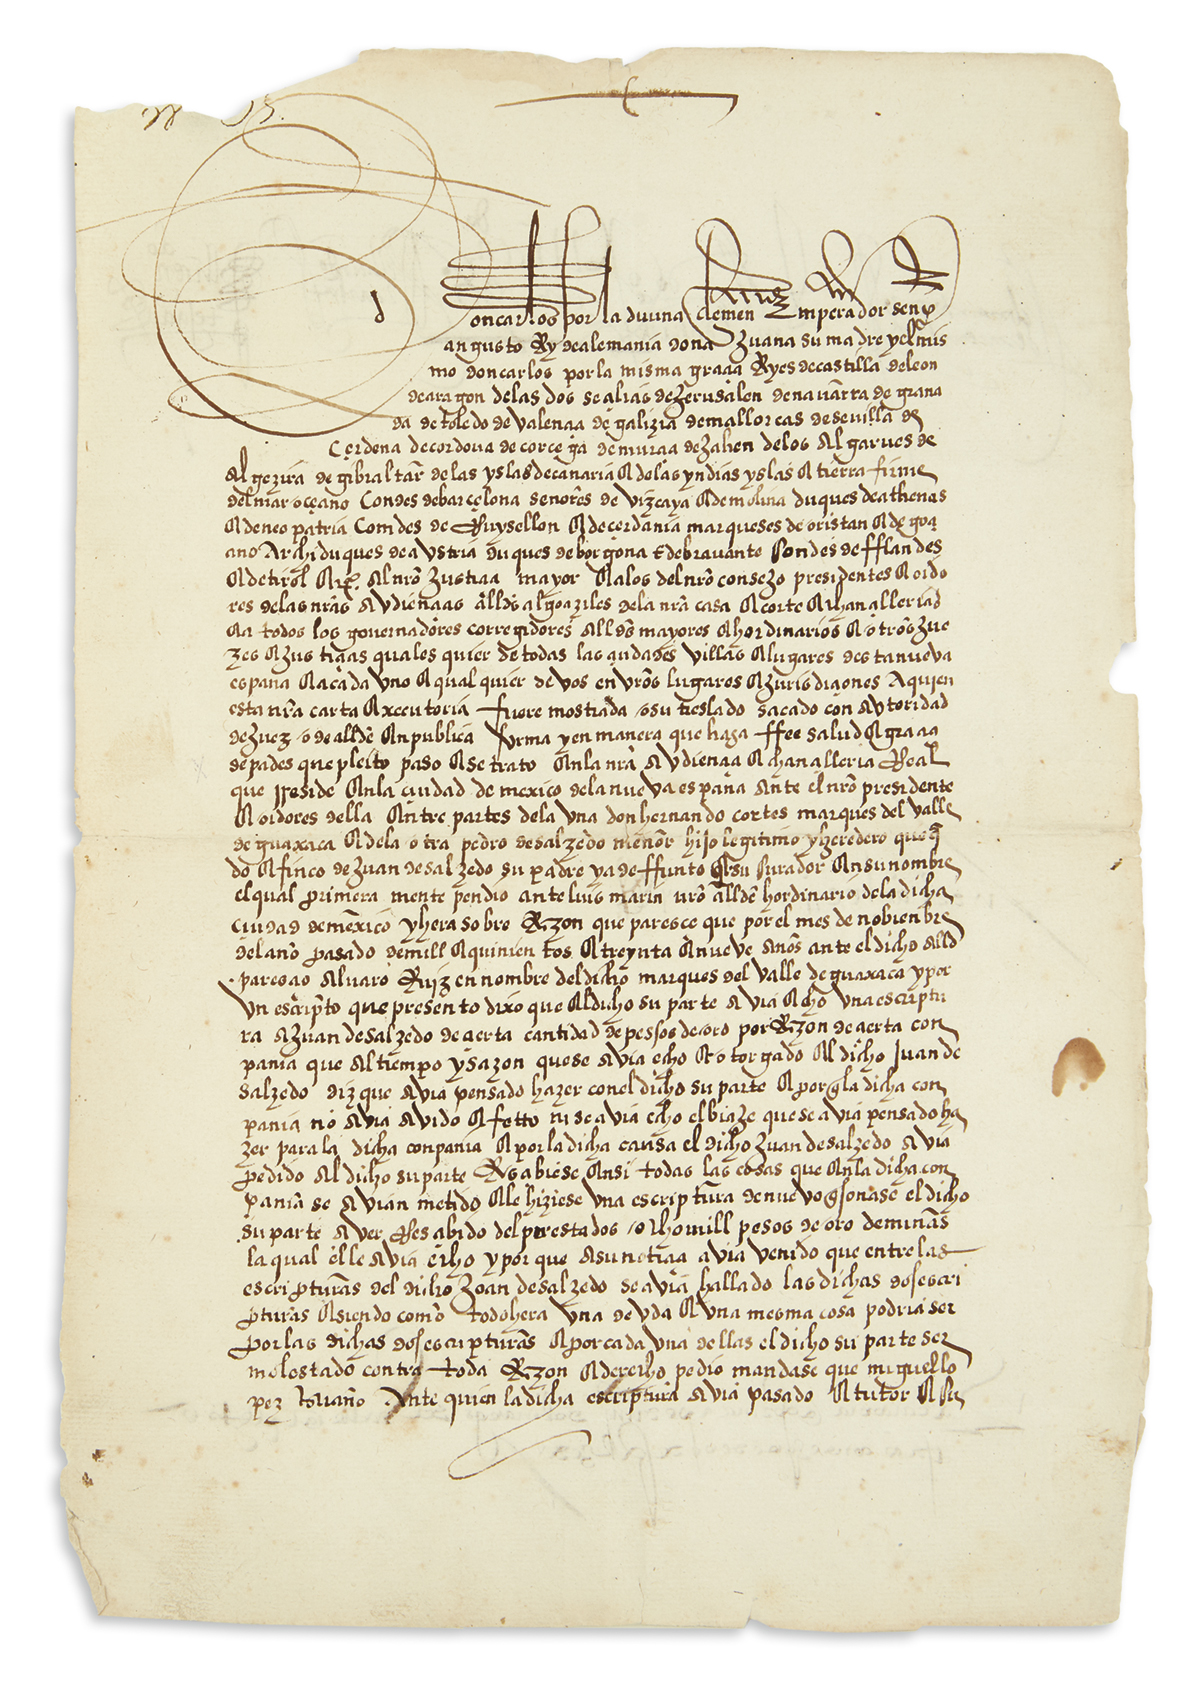 (MEXICAN MANUSCRIPTS.) Mendoza, Antonio de. Decree by the Viceroy of New Spain in a lawsuit against Hernán Cortés.